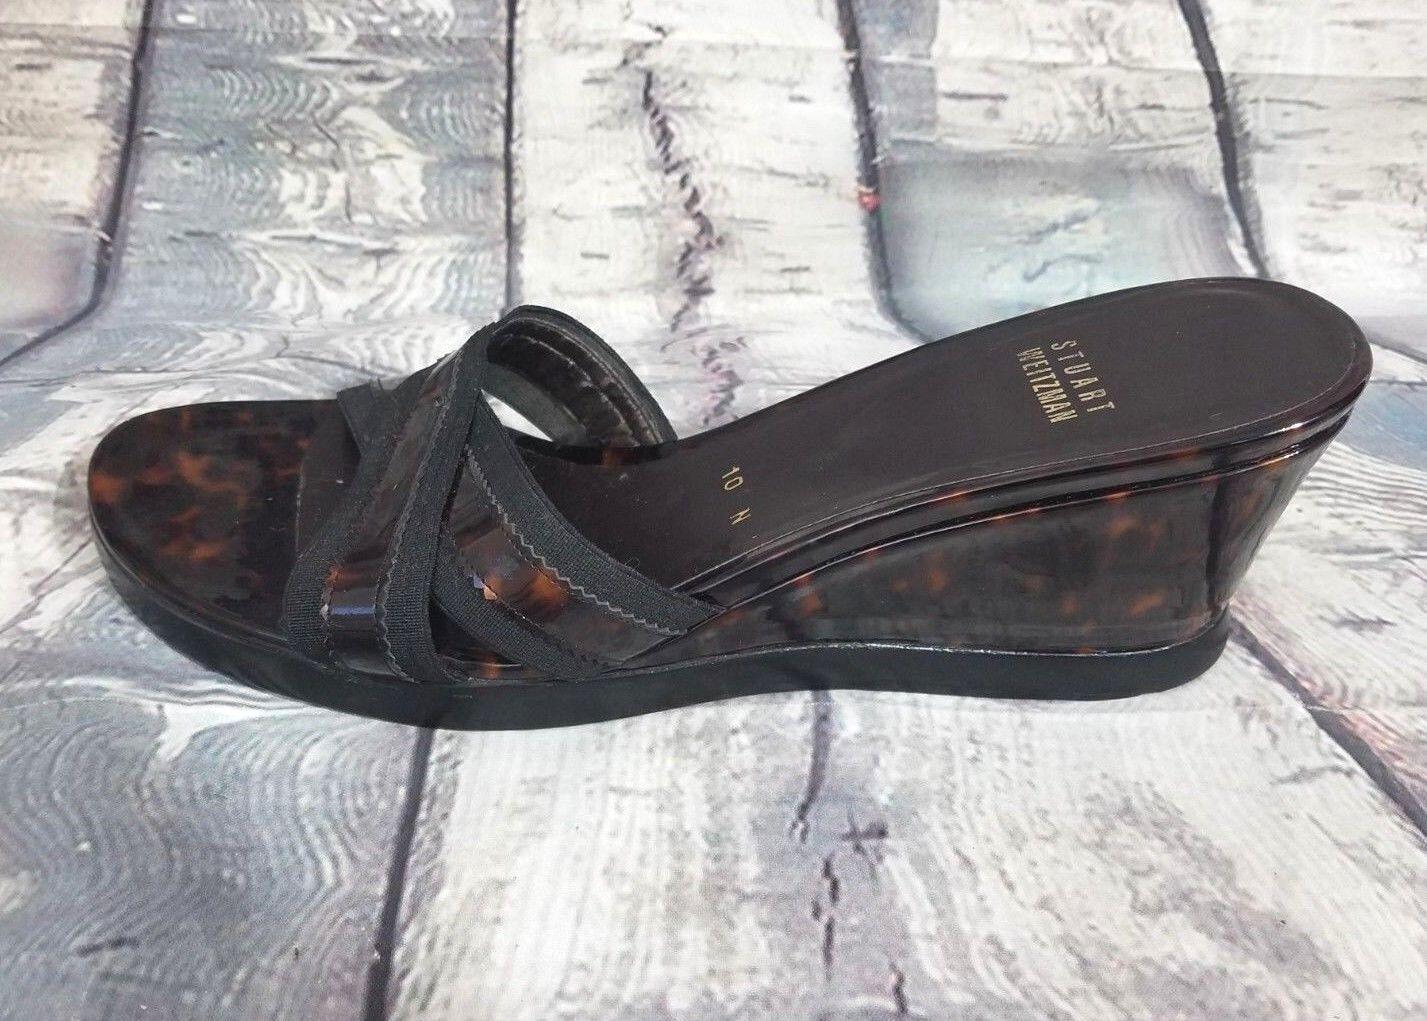 Stuart Weitzman Spain Patent Leather Tortoise Shell Slip On Wedge Sandals 10N